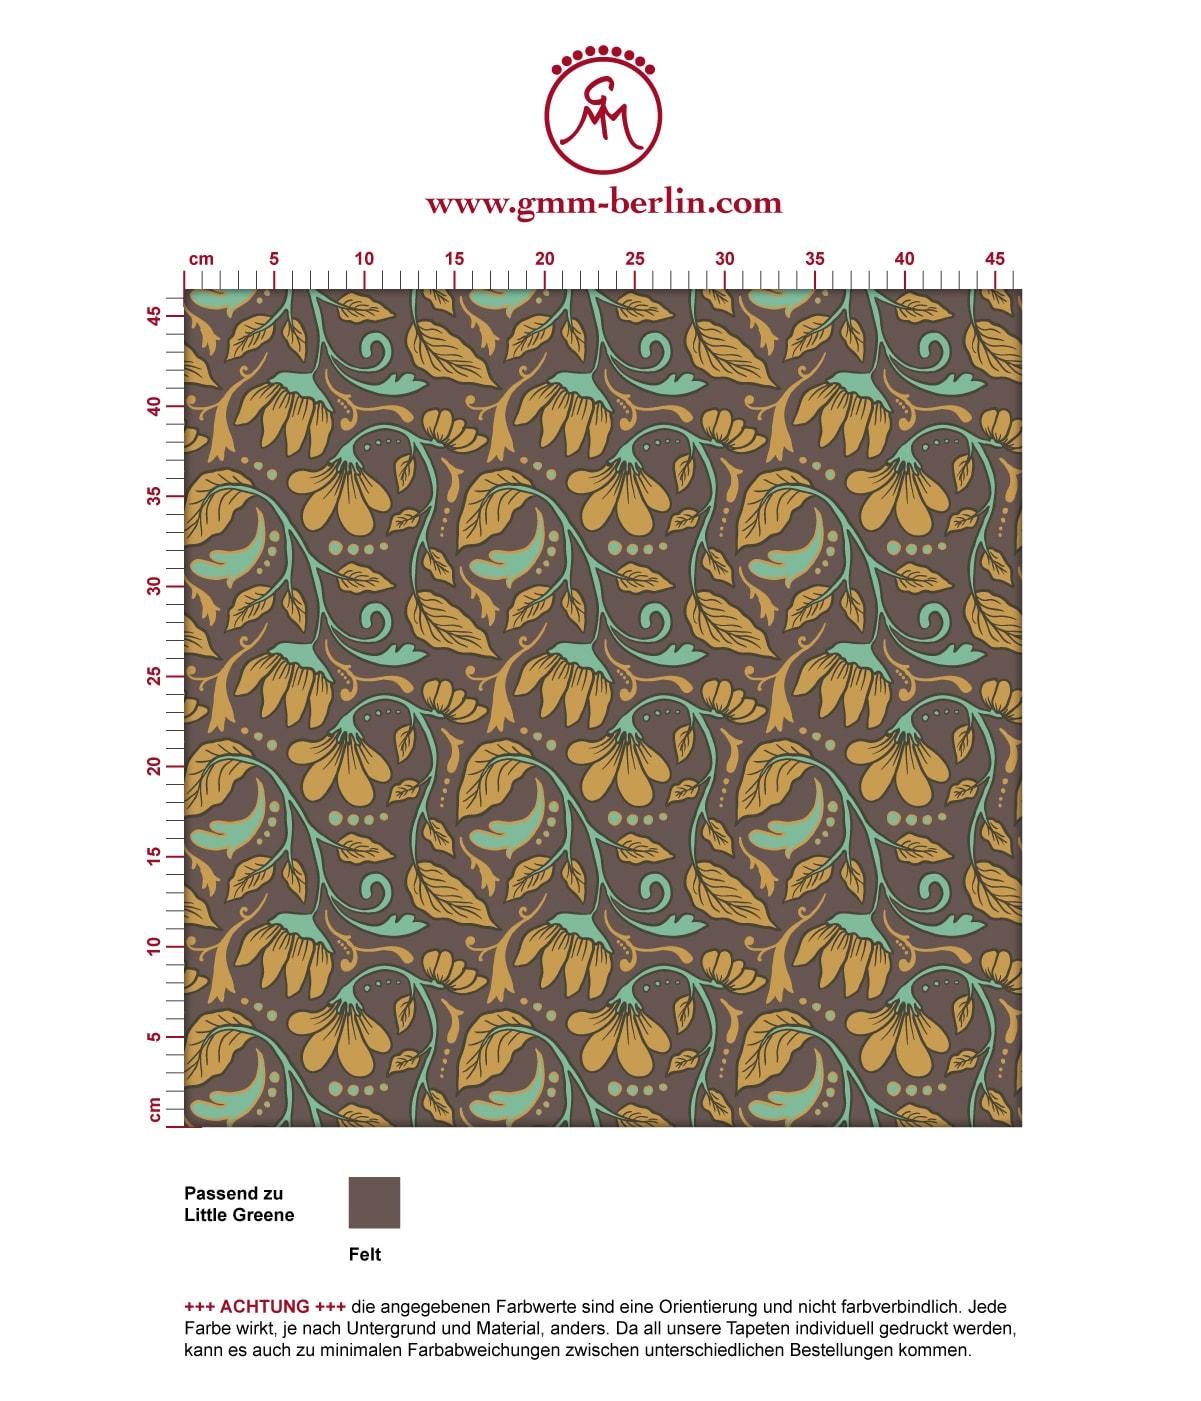 "Edle Jugendstil Tapete ""Fleur Arabesque"" mit Blüten Ranken in braun angepasst an Little Greene Wandfarben 3"